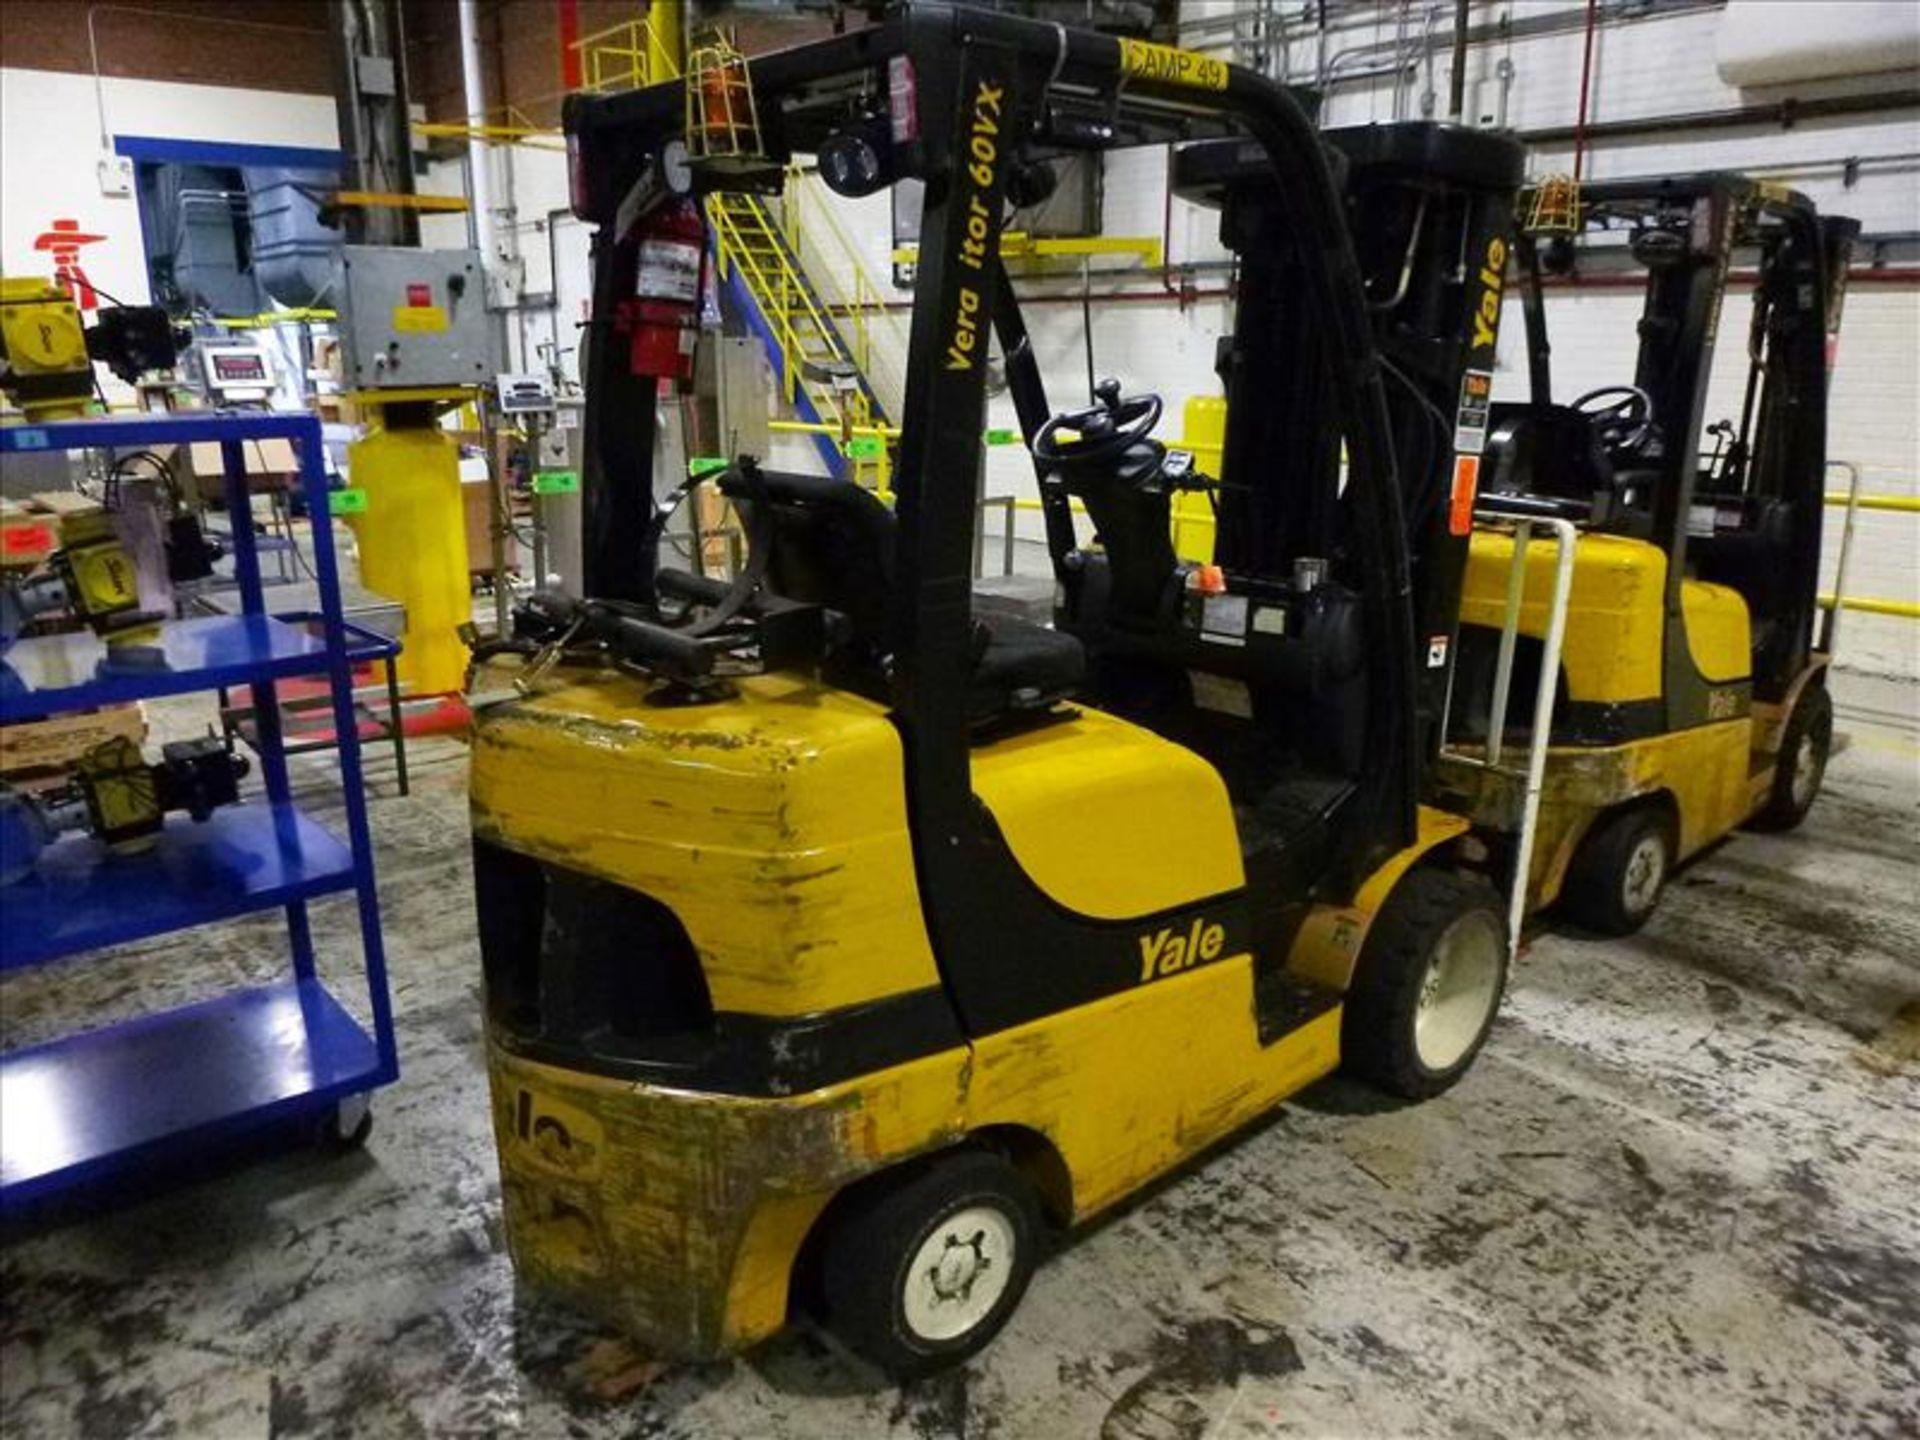 Yale fork lift truck, mod. GLC060VXNVSQ084, ser. no. A91V15562G, LPG, 4000 lbs cap., 240 in. lift - Image 2 of 4